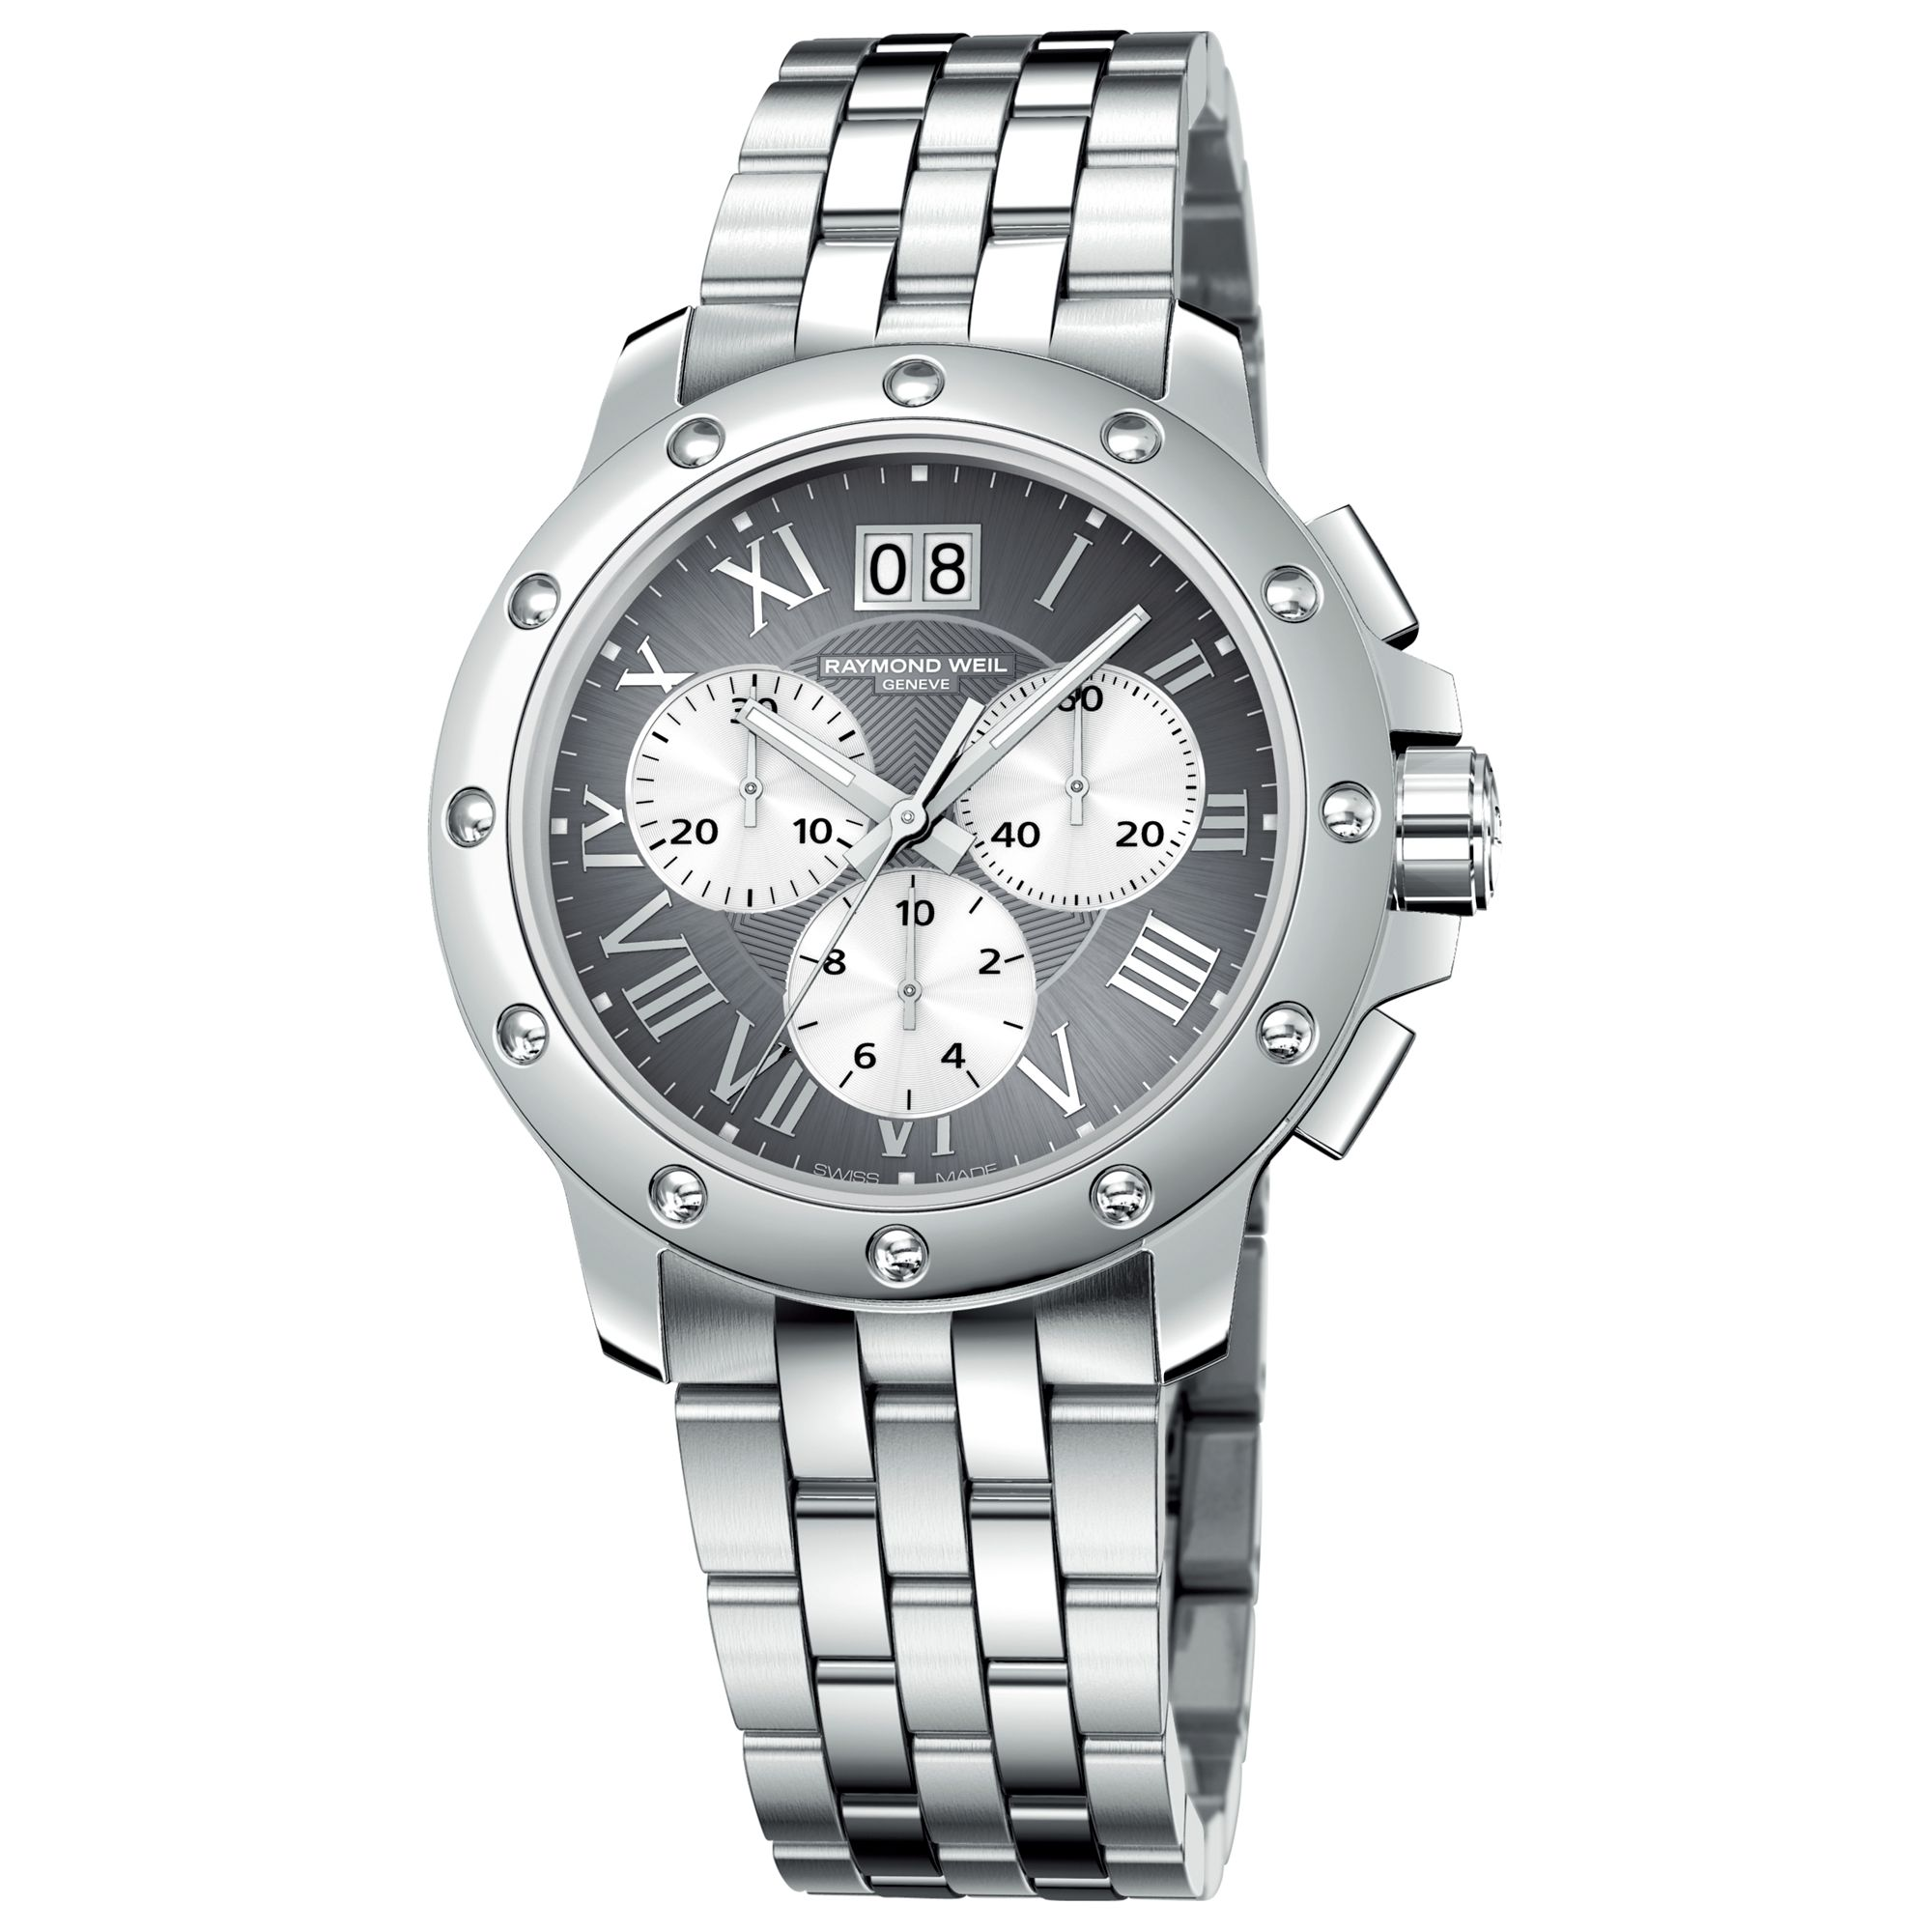 Raymond Weil 4899-ST-00668 Tango Chronograph Stainless Steel Bracelet Watch